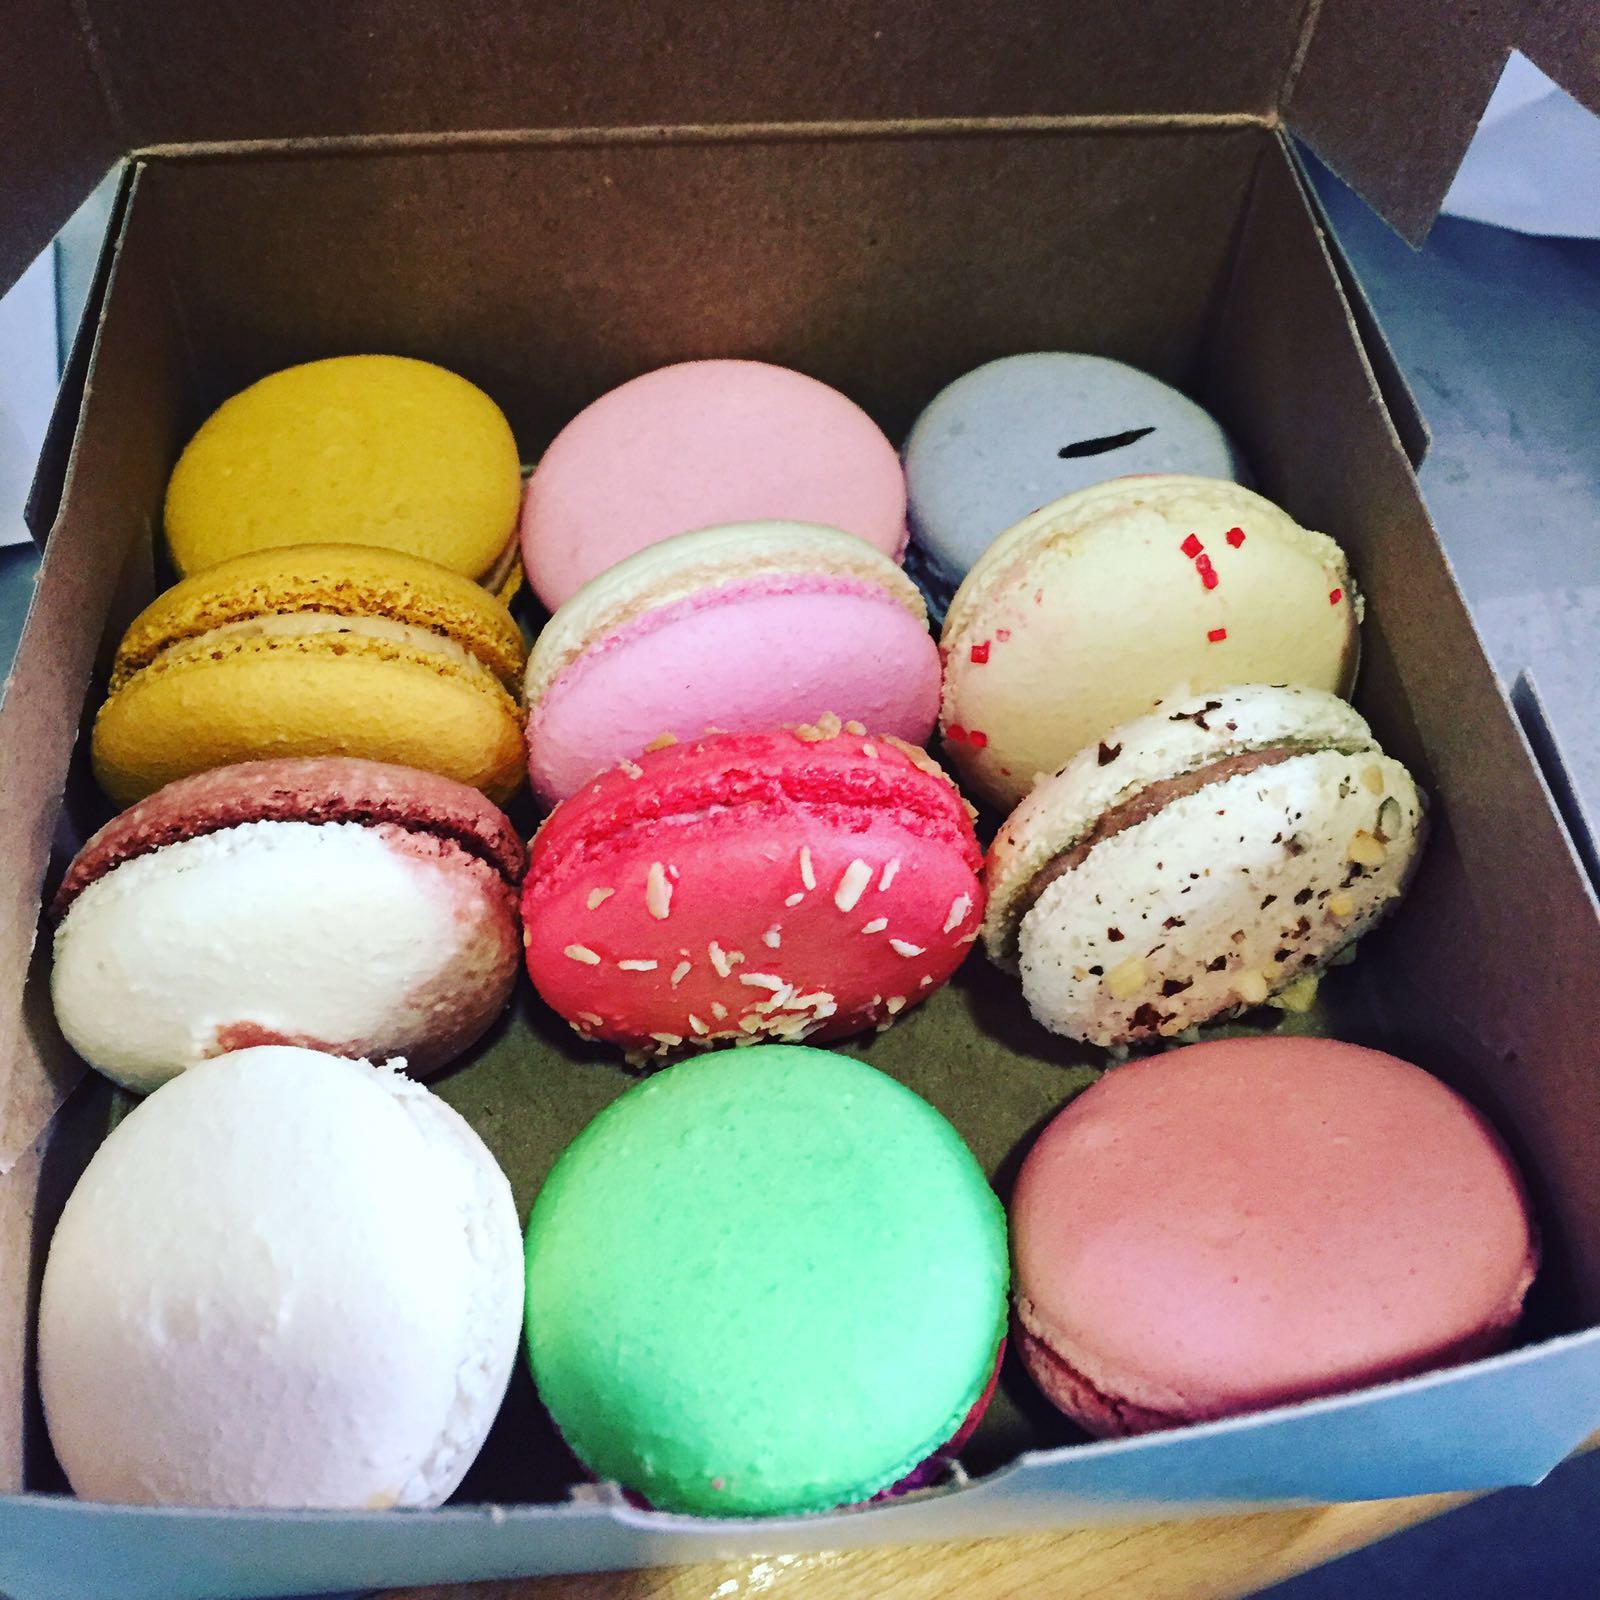 Bon Macaron Patisserie's French Macarons